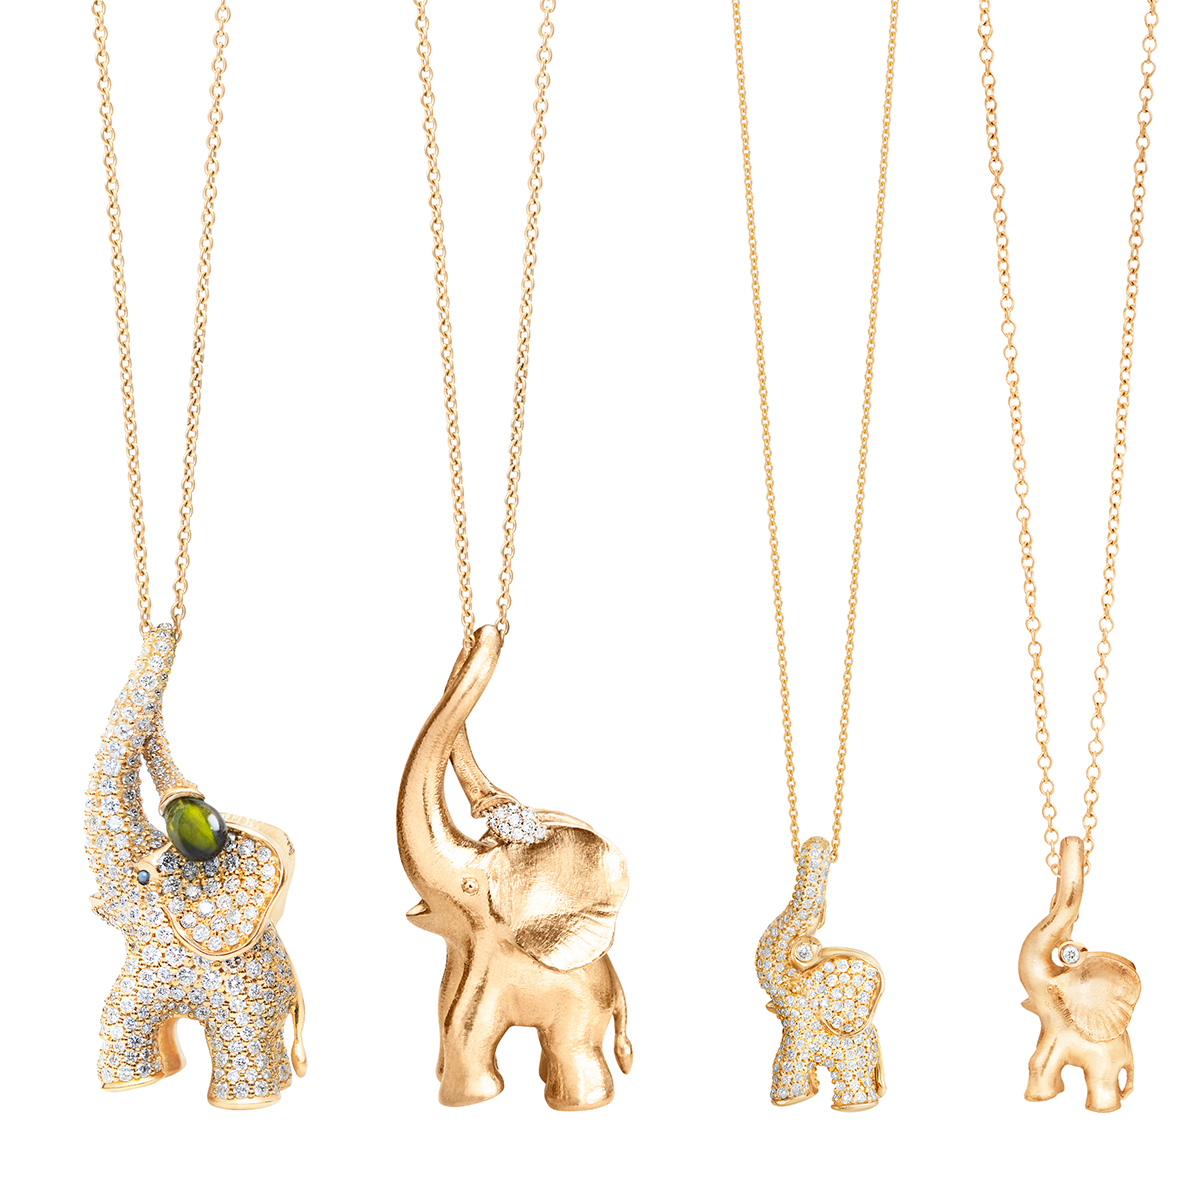 OLC_Collection_Elephant.jpg